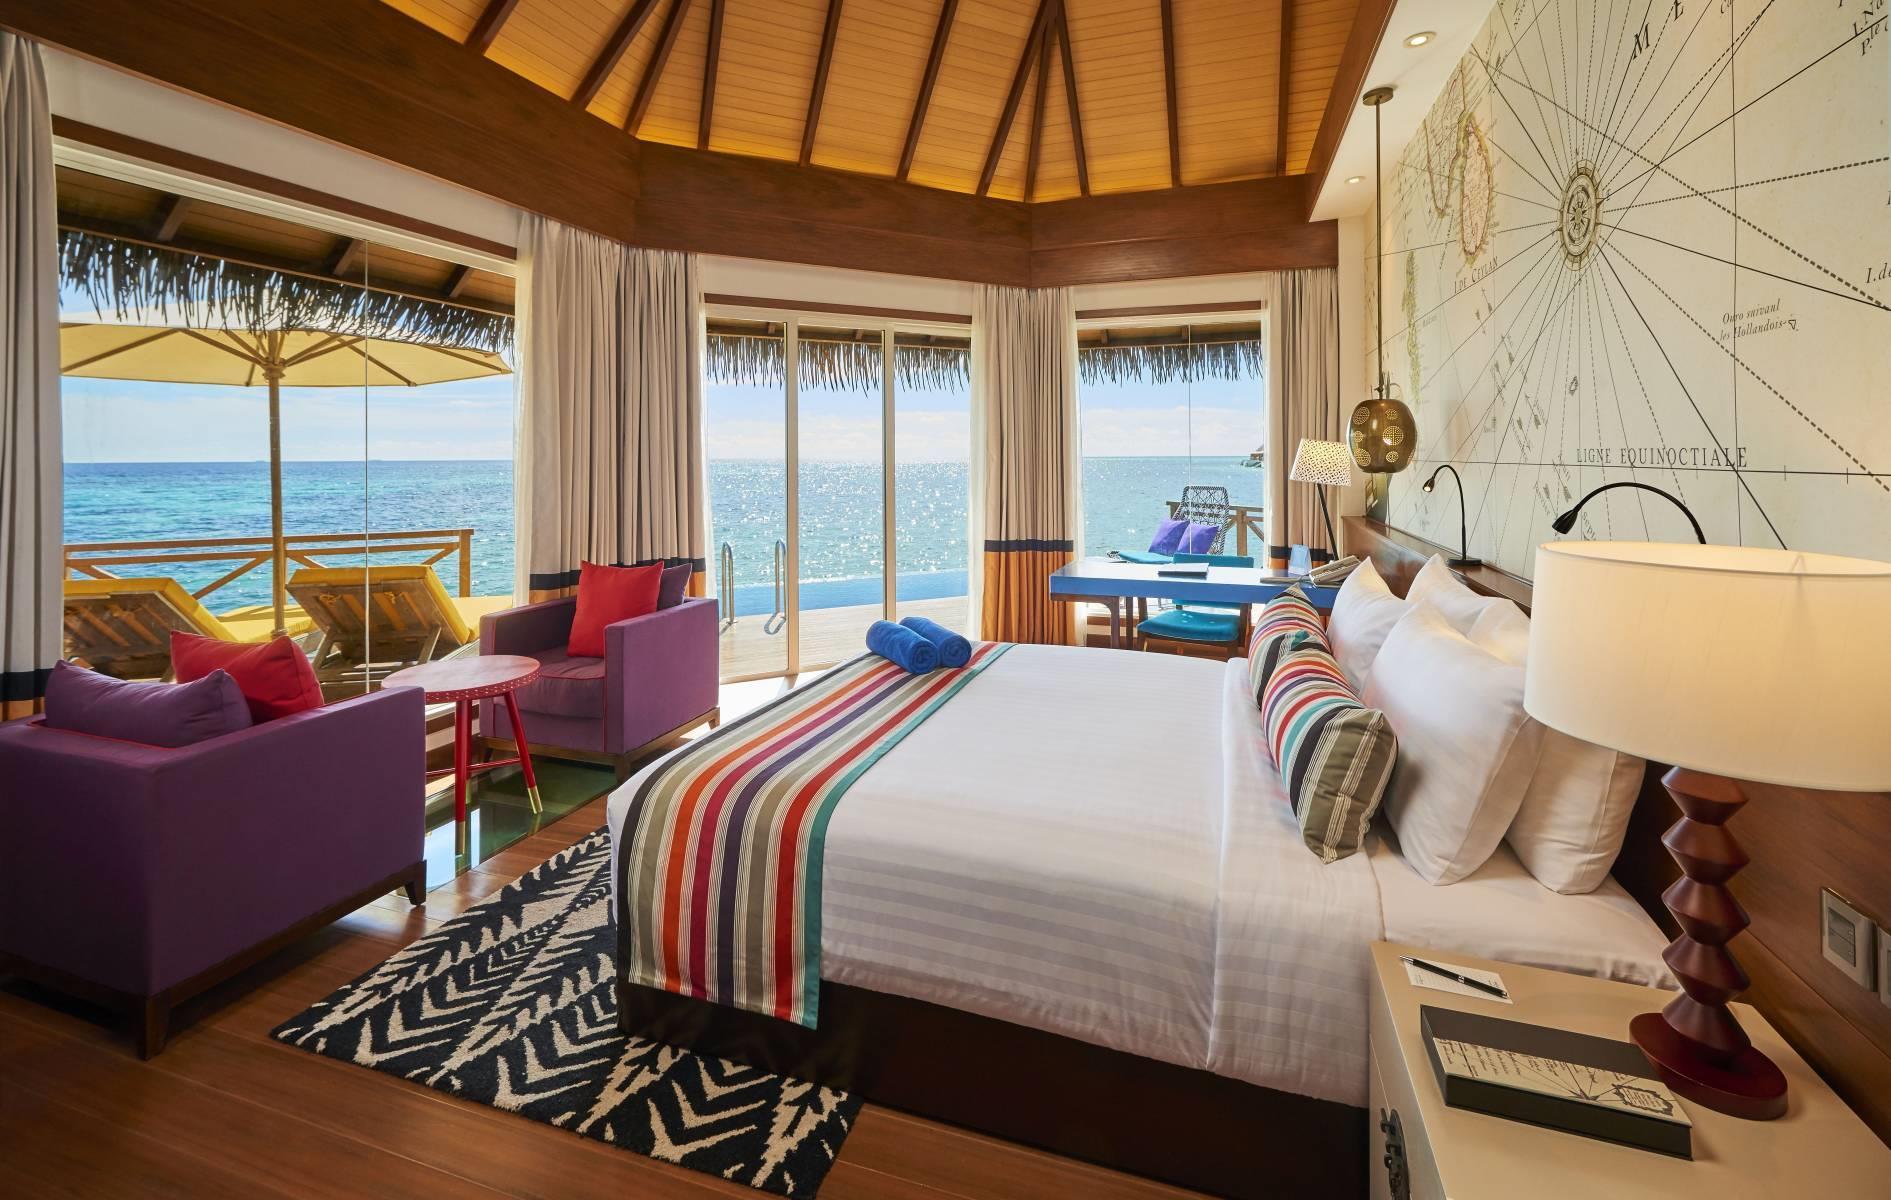 mercure-maldives-kooddoo-resort-genel-0011